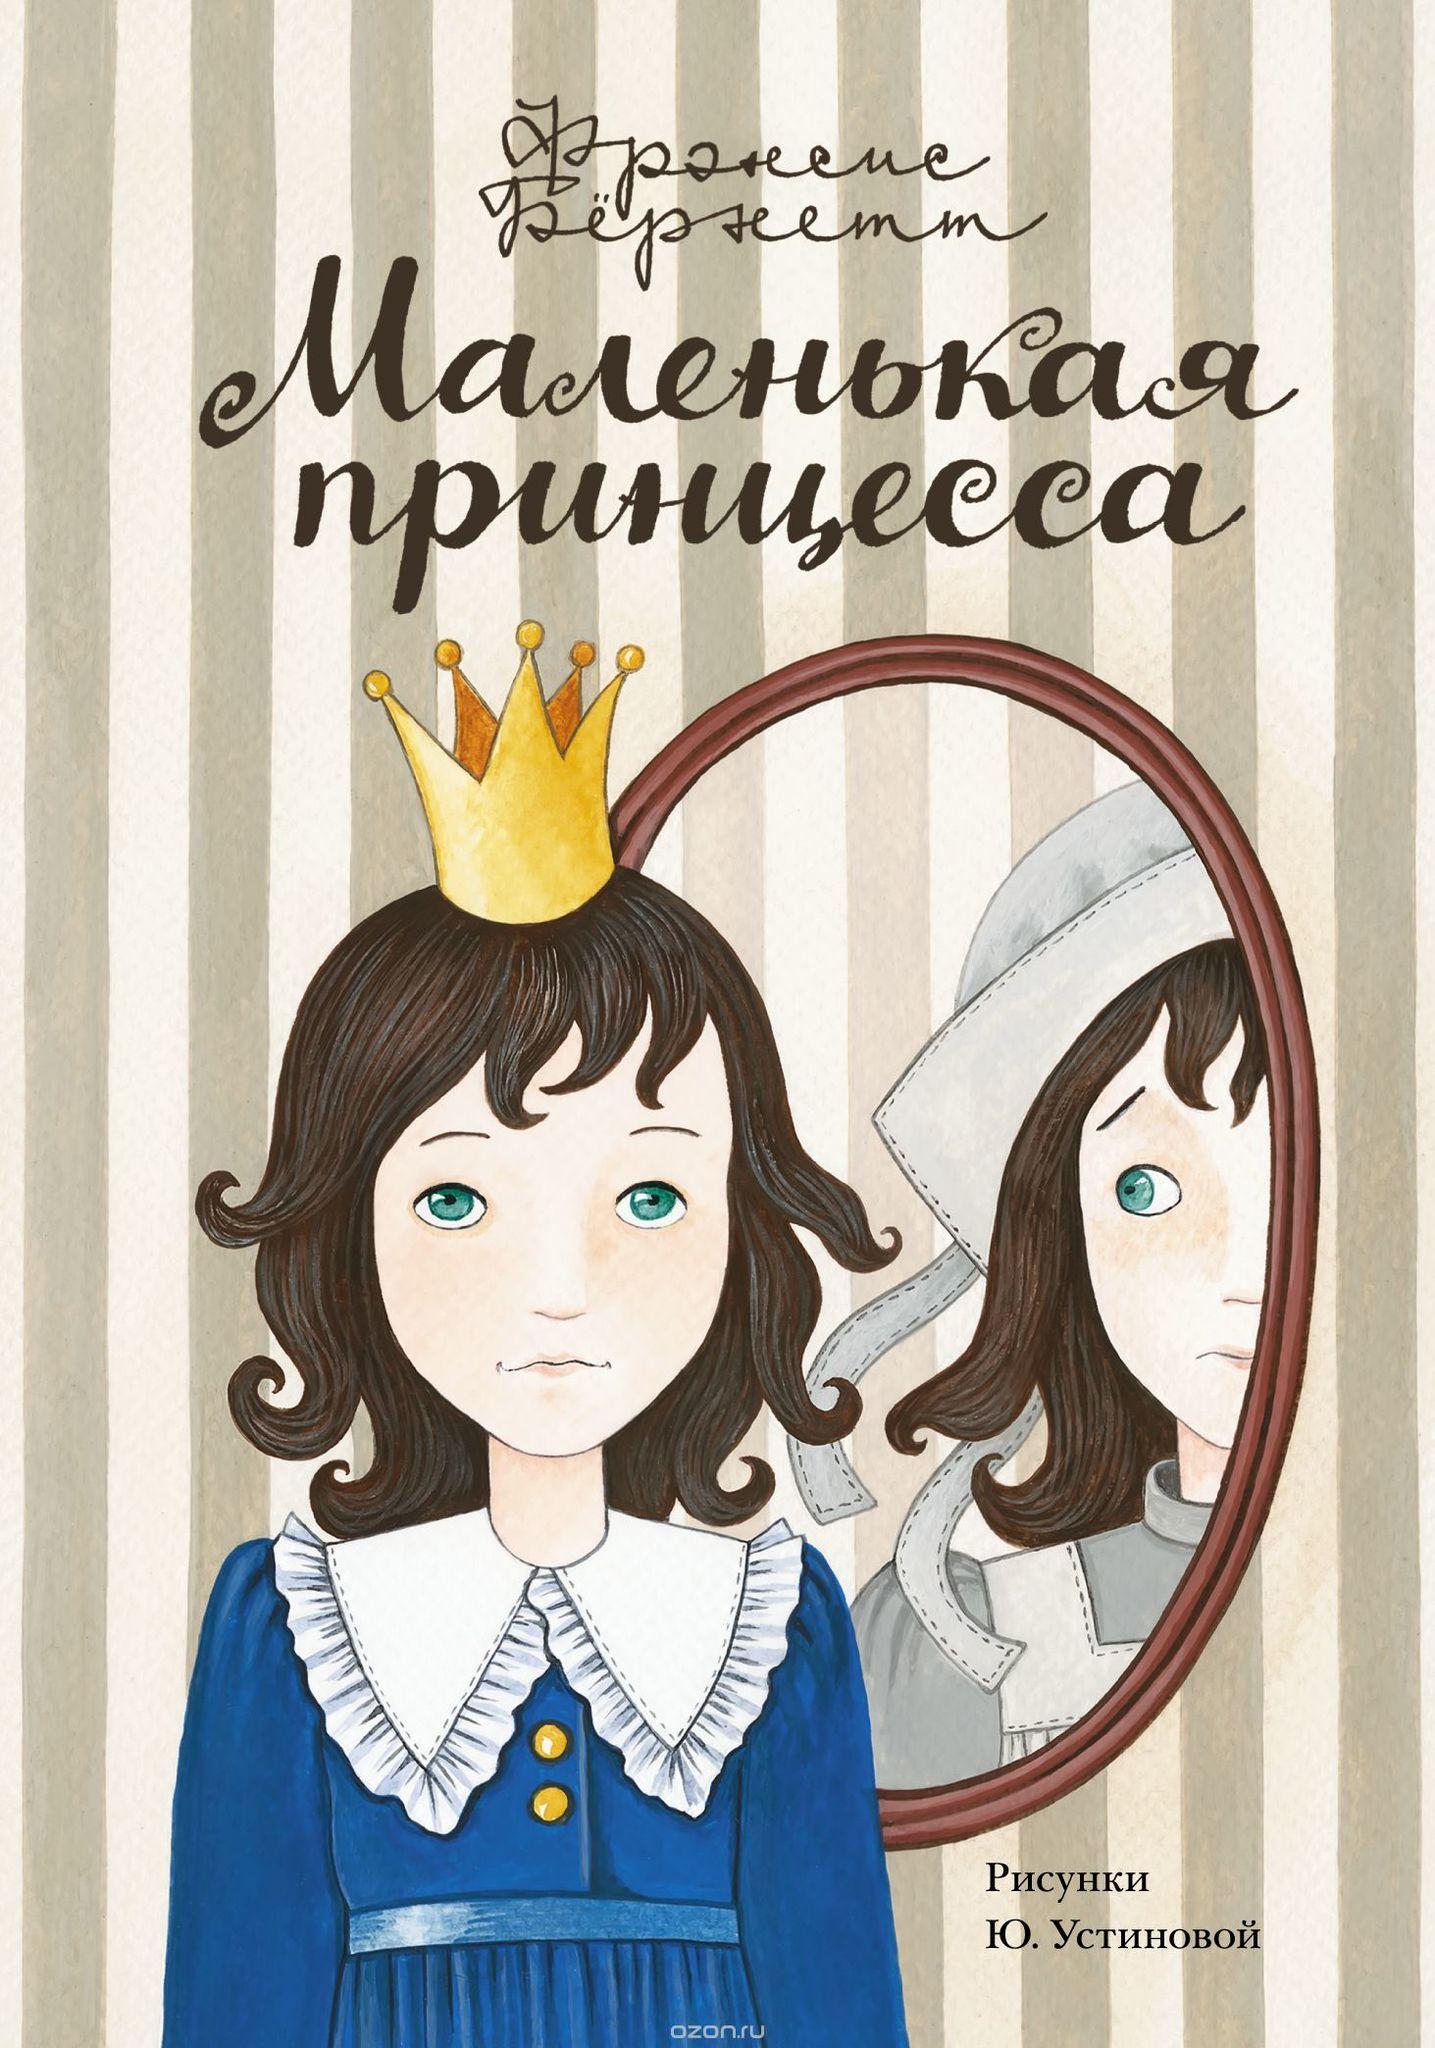 Kitab Маленькая принцесса | Фрэнсис Элиза Ходгстон Бернетт